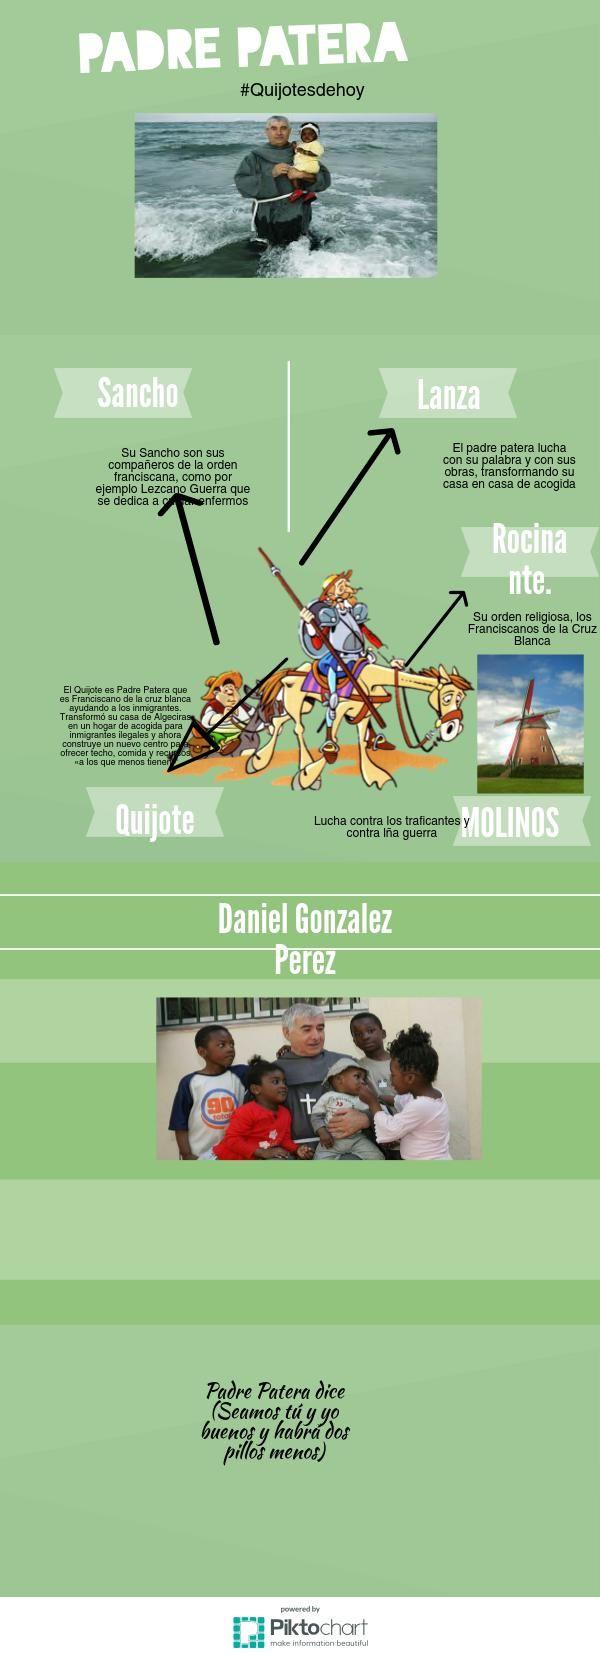 PADRE PATERA #Quijotesdehoy   Piktochart Infographic Editor